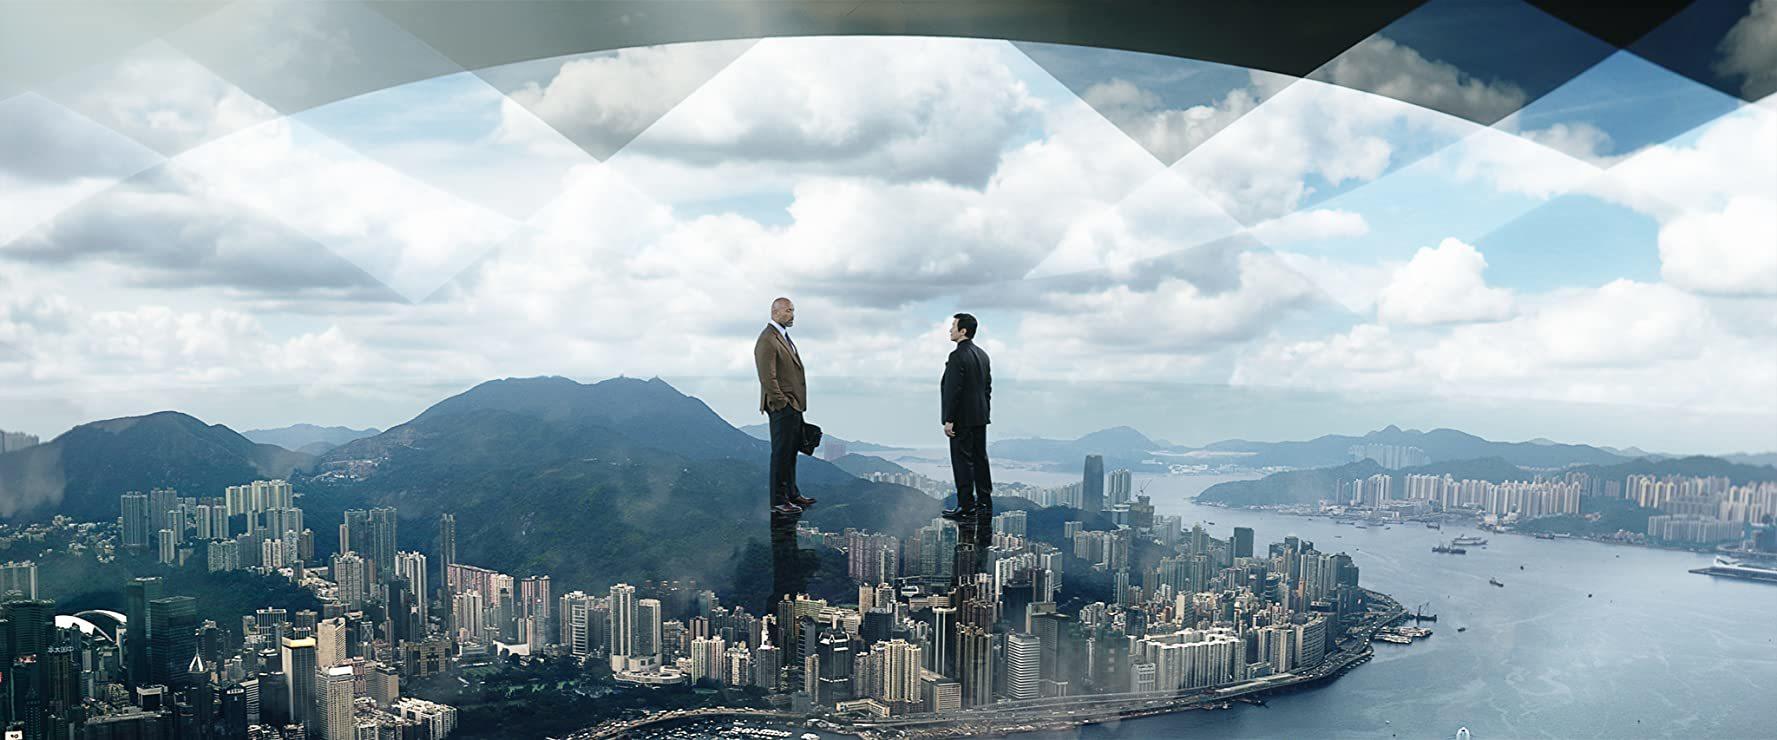 Universal Pictures/Skyscraper